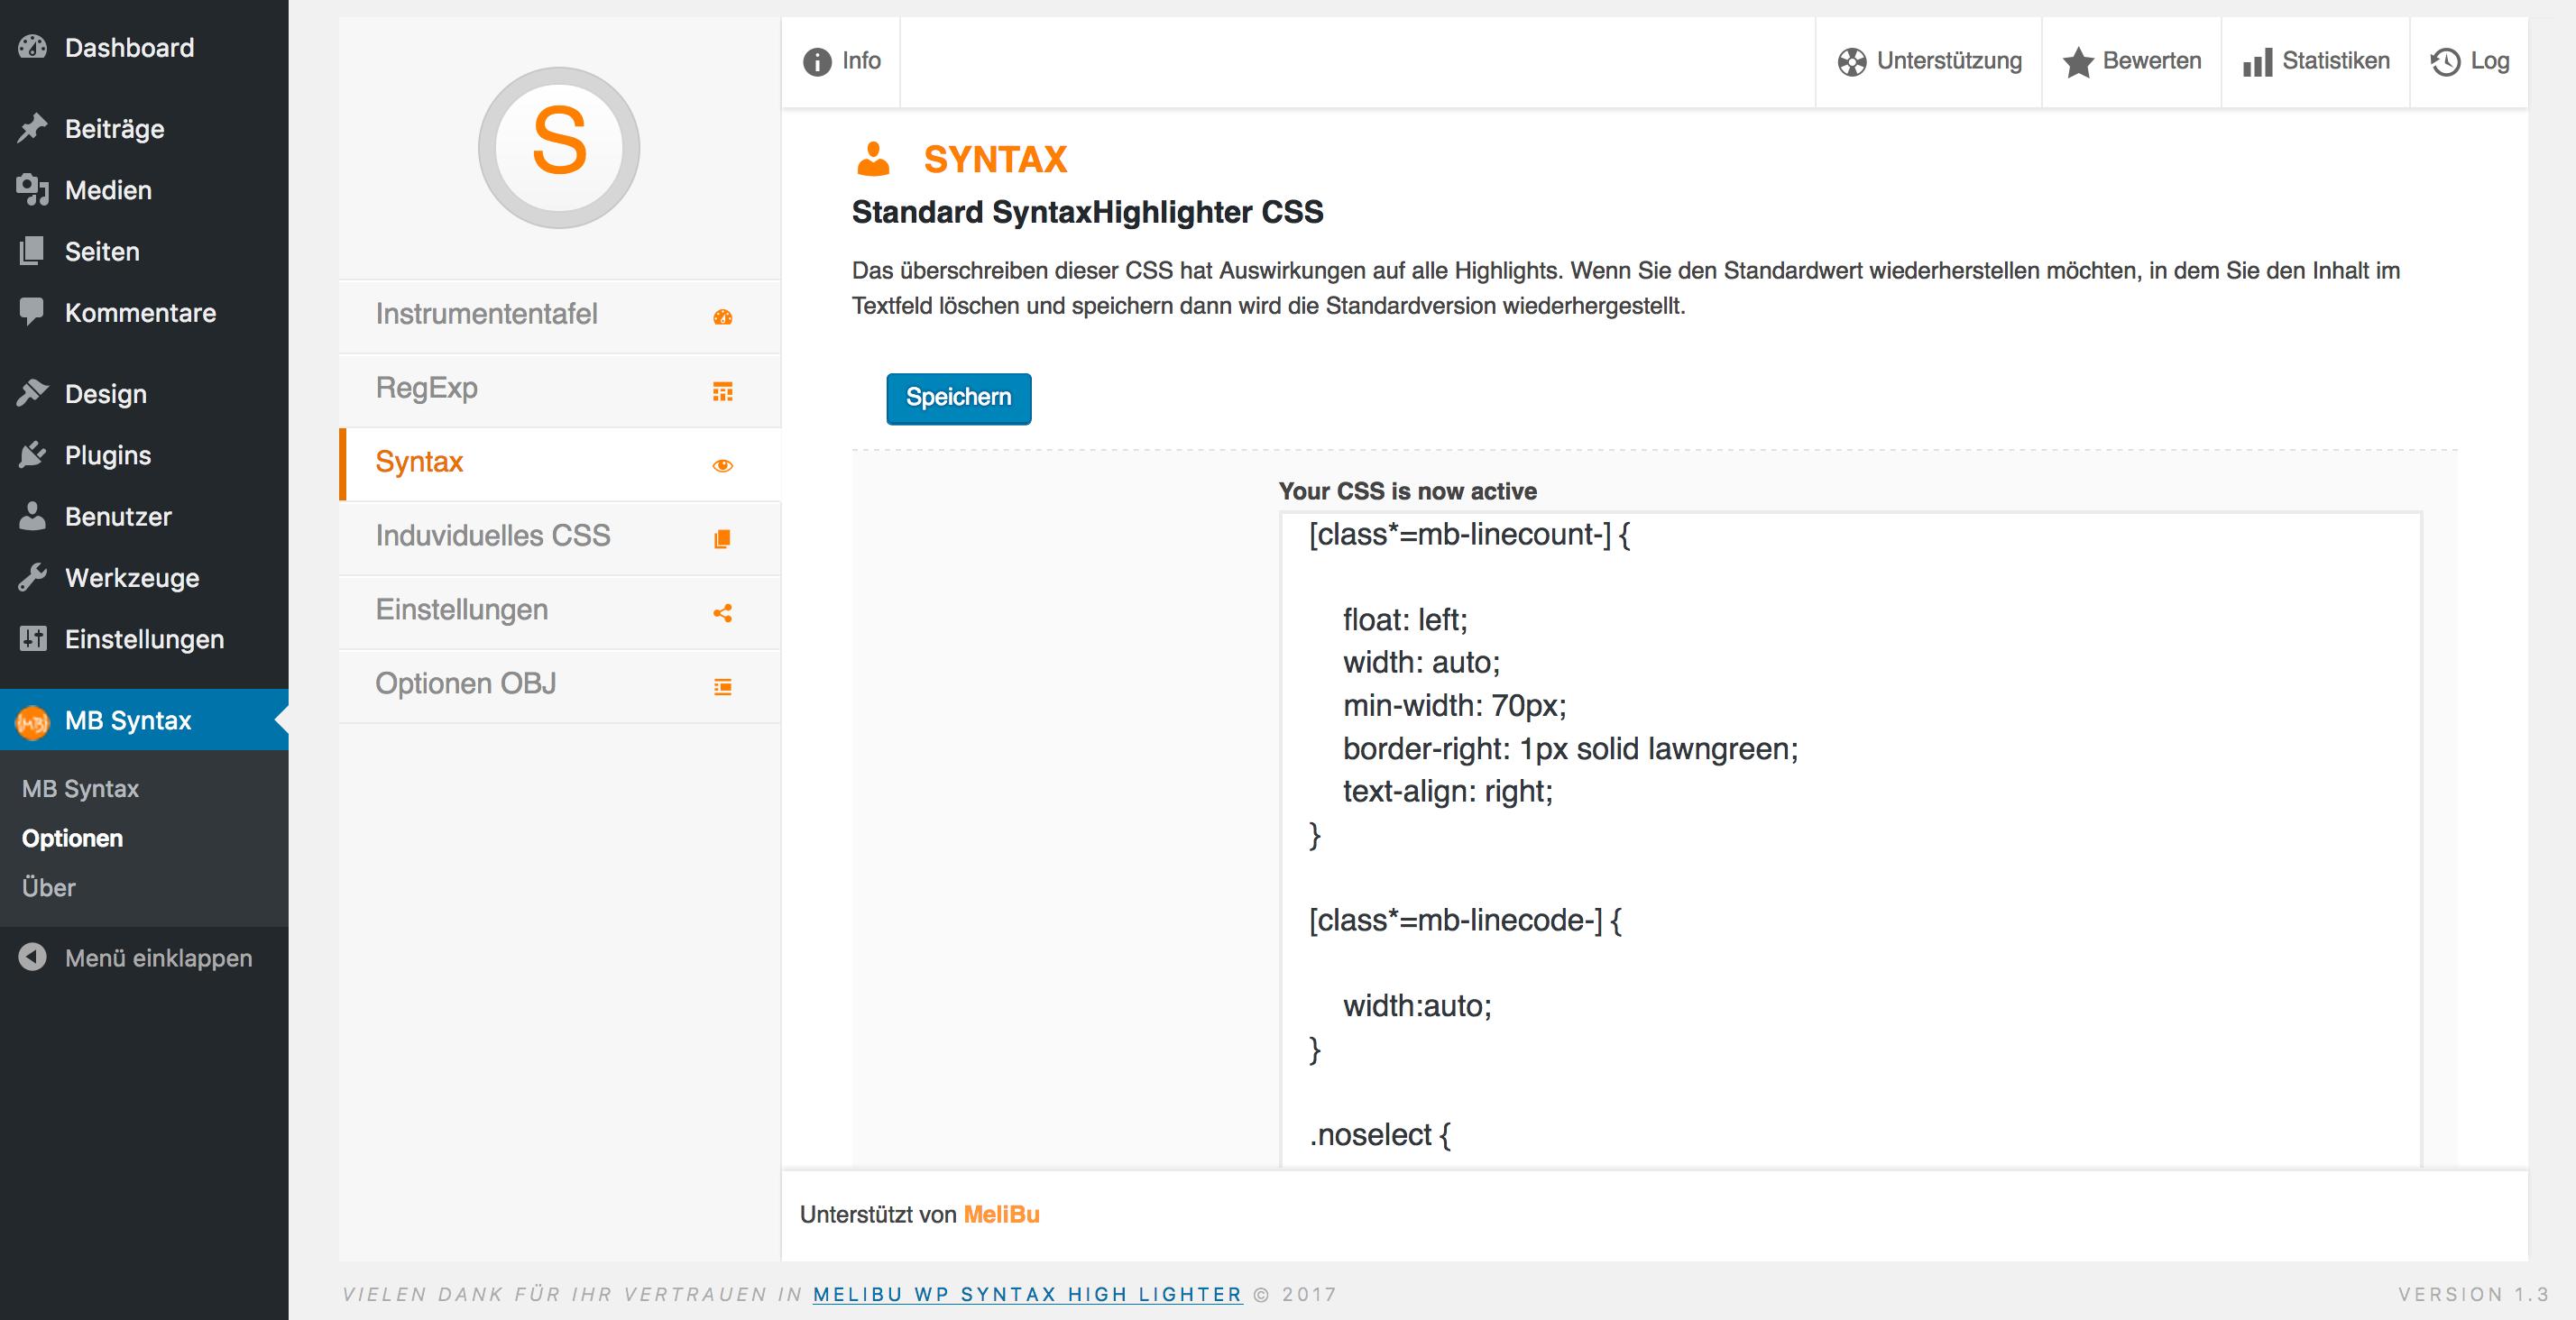 CSS access